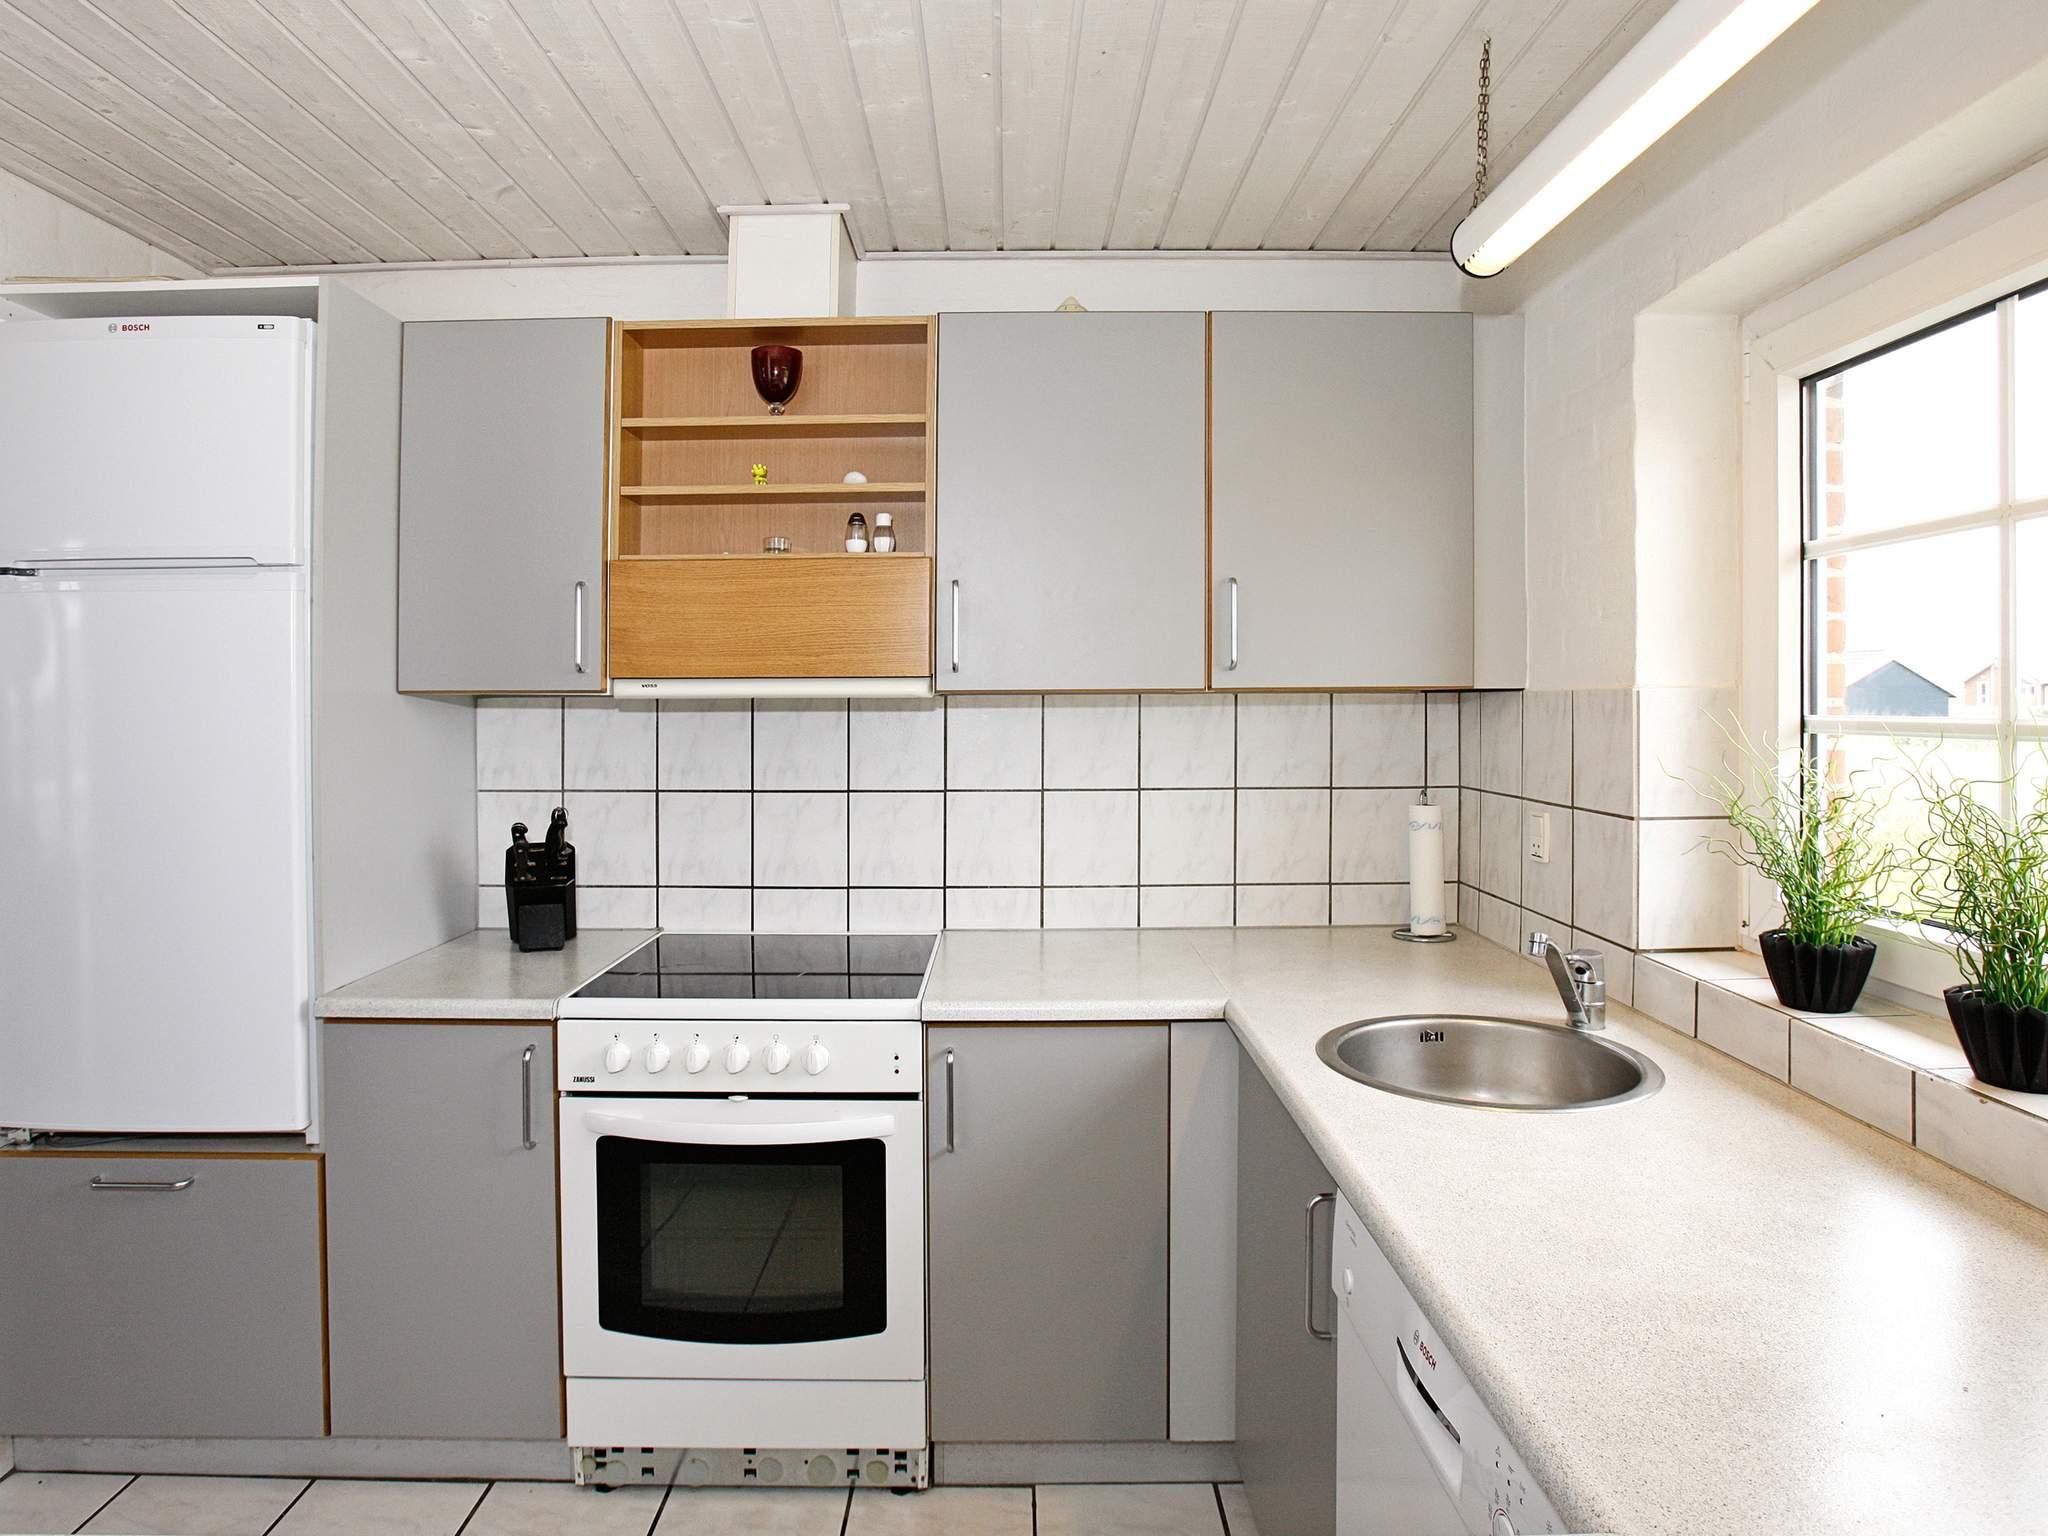 Ferienhaus Vrist (88916), Vrist, , Limfjord, Dänemark, Bild 8